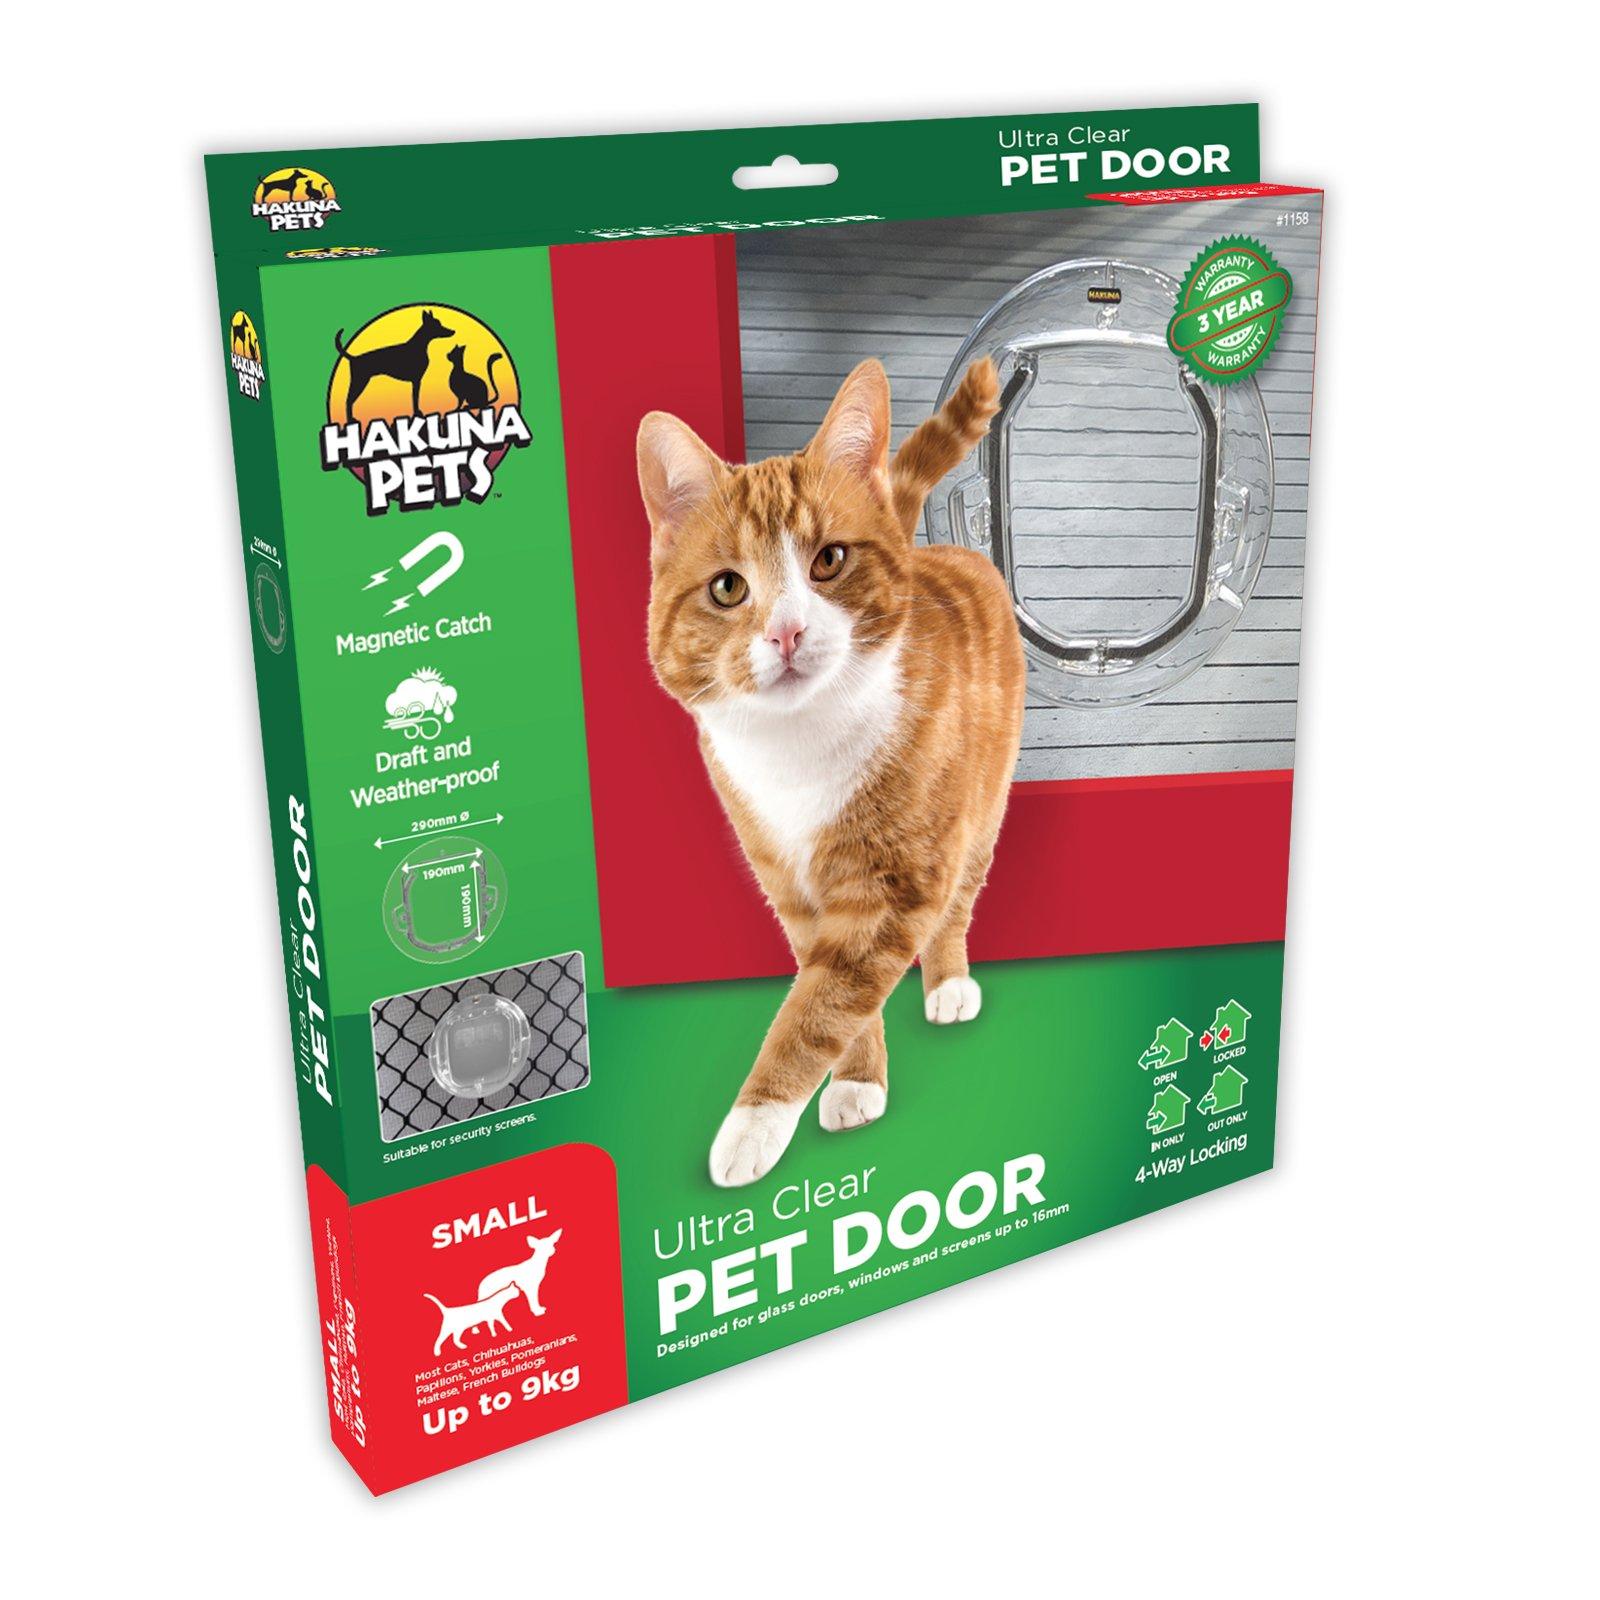 Cheap Cat Proof Window Screens Find Cat Proof Window Screens Deals